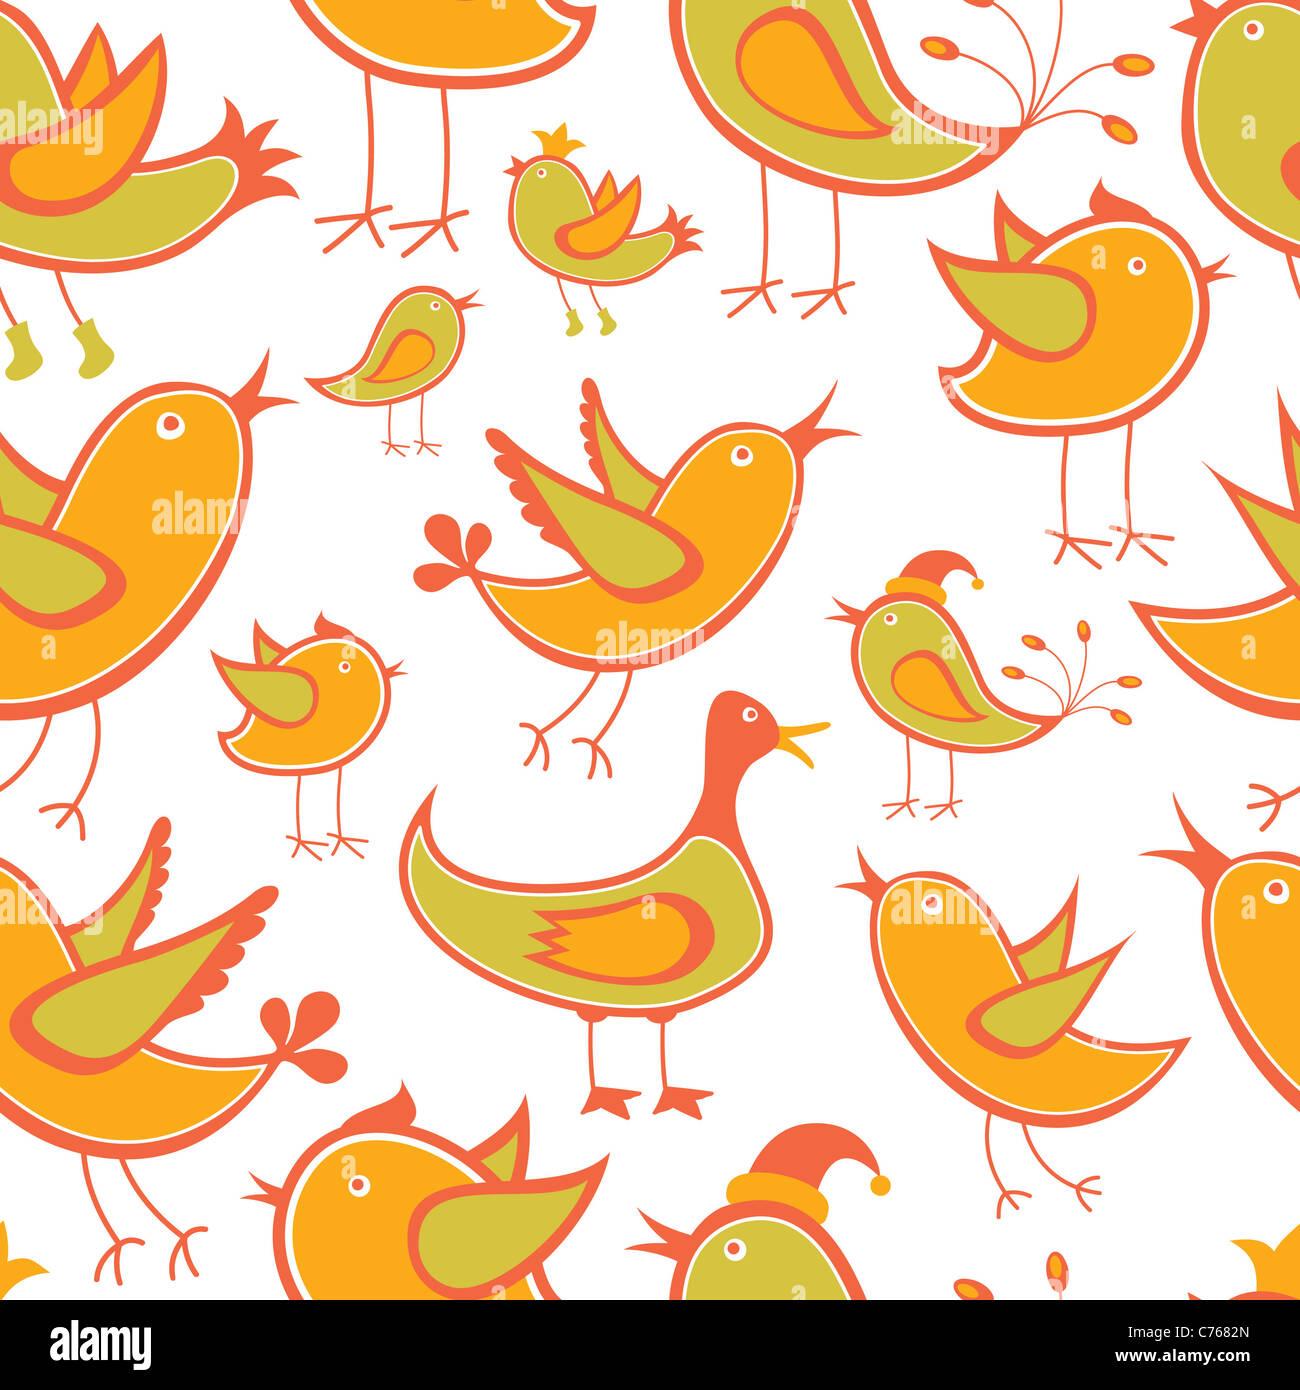 Seamless Bird Background or Wallpaper - Stock Image